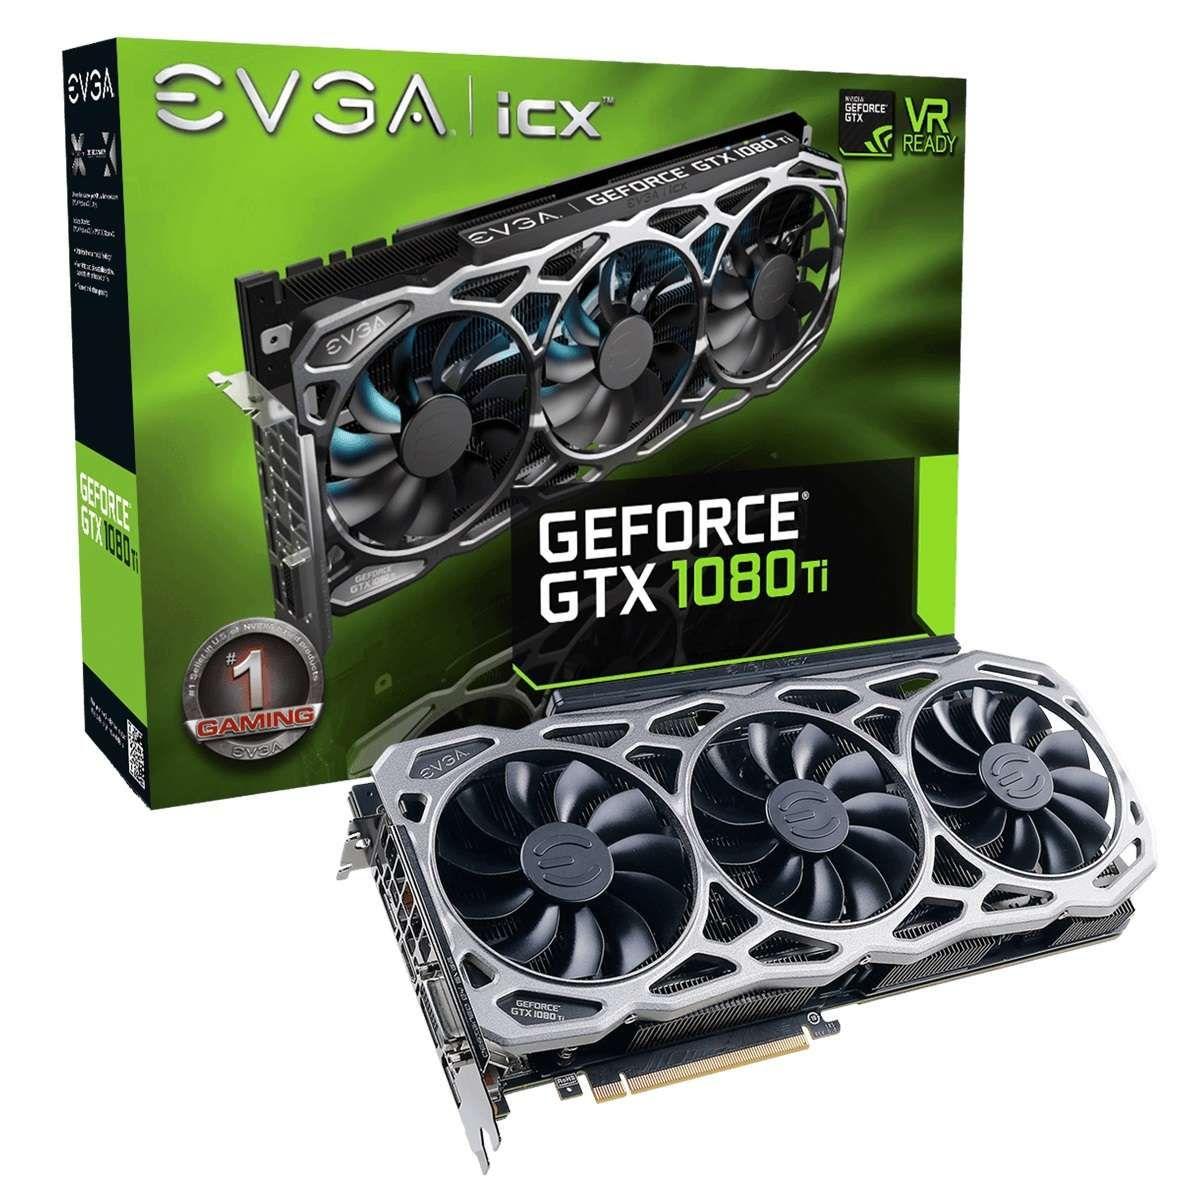 Placa de Video EVGA GeForce GTX 1080 Ti FTW3 Gaming 11GB GDDR5X-11G-P4-6696-KR